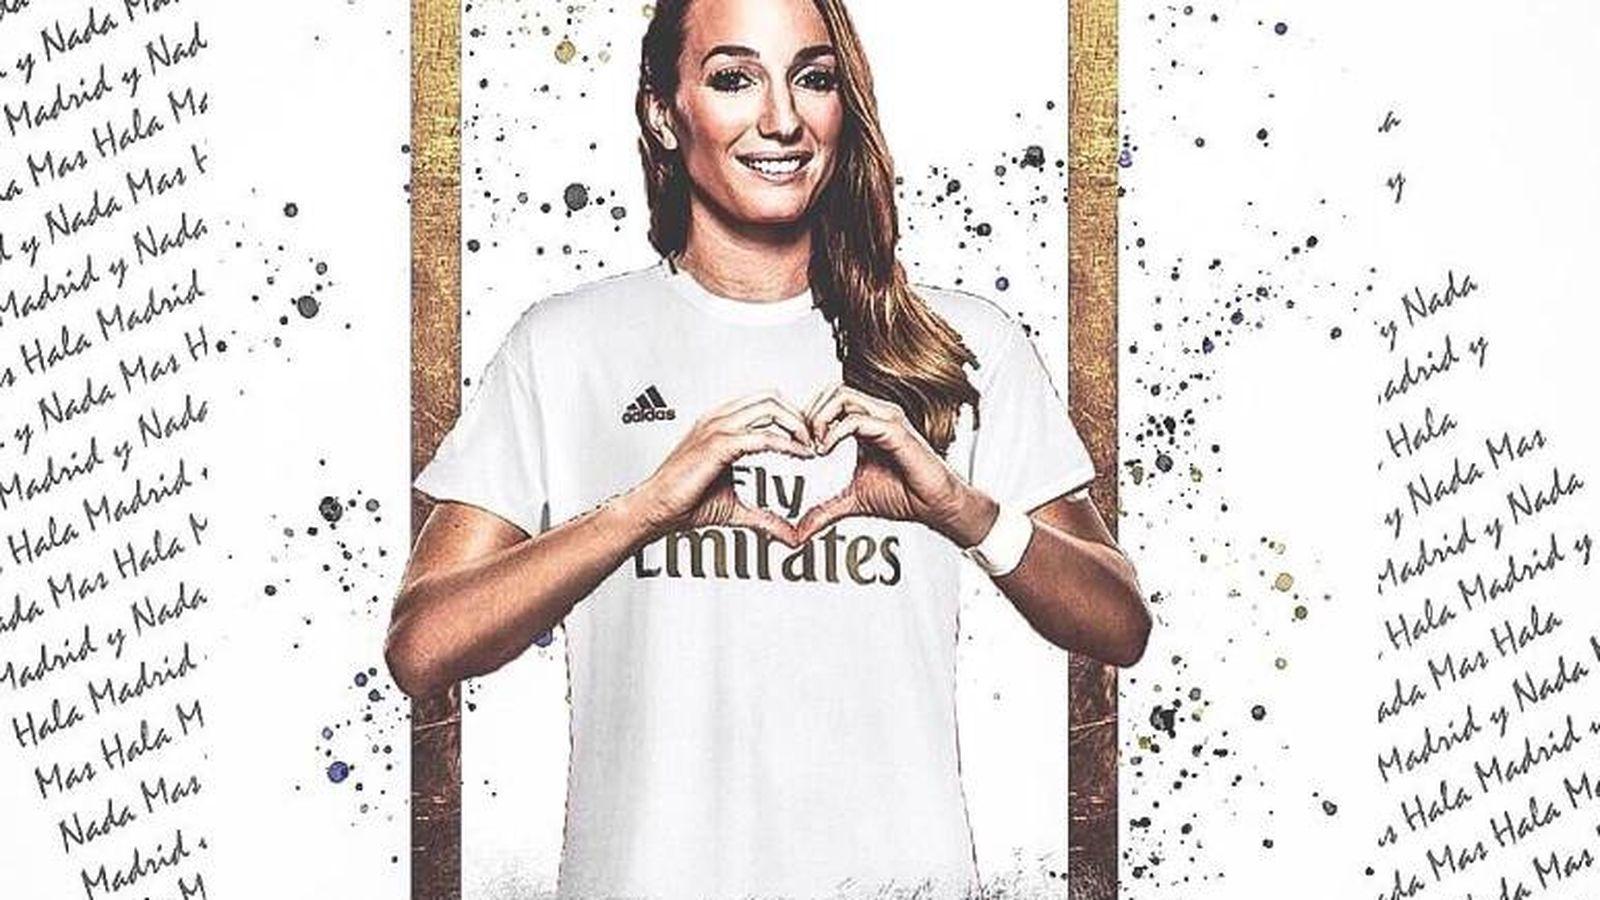 Foto: Kosovare Asllani, nueva jugadora del CD Tacón (ahora, Real Madrid femenino). @KosovareAsllani